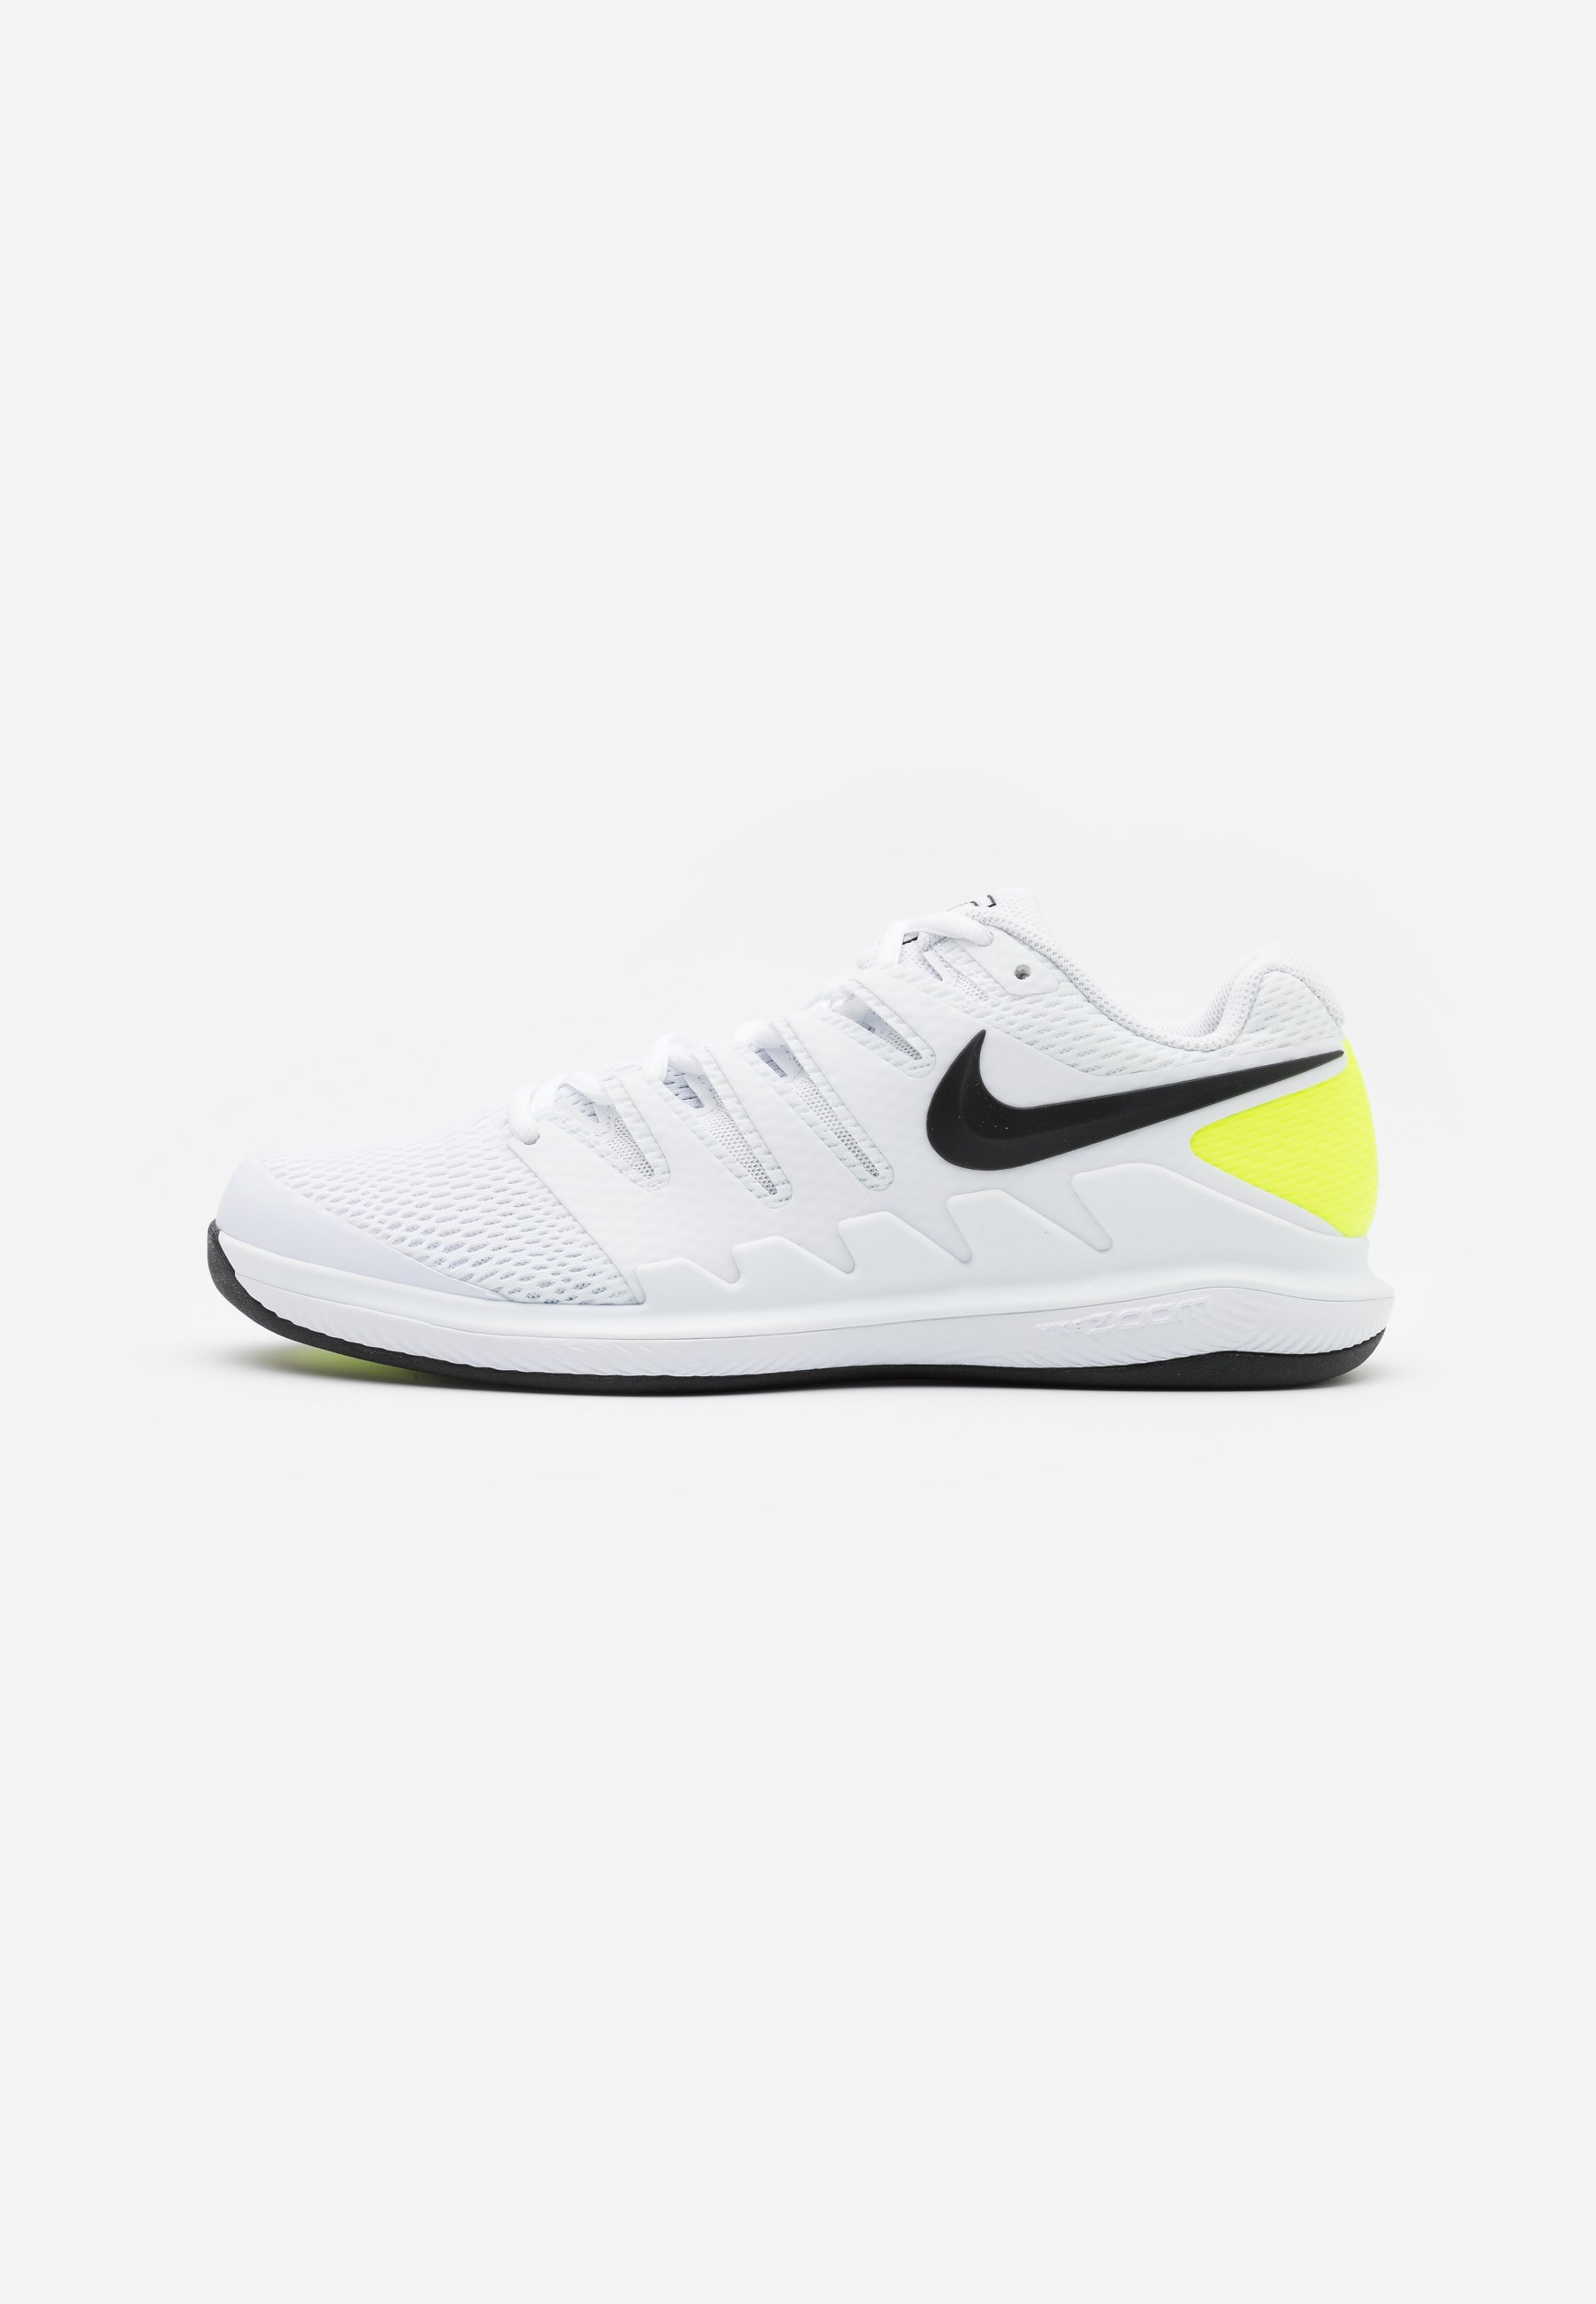 Scarpe da tennis uomo | Zalando